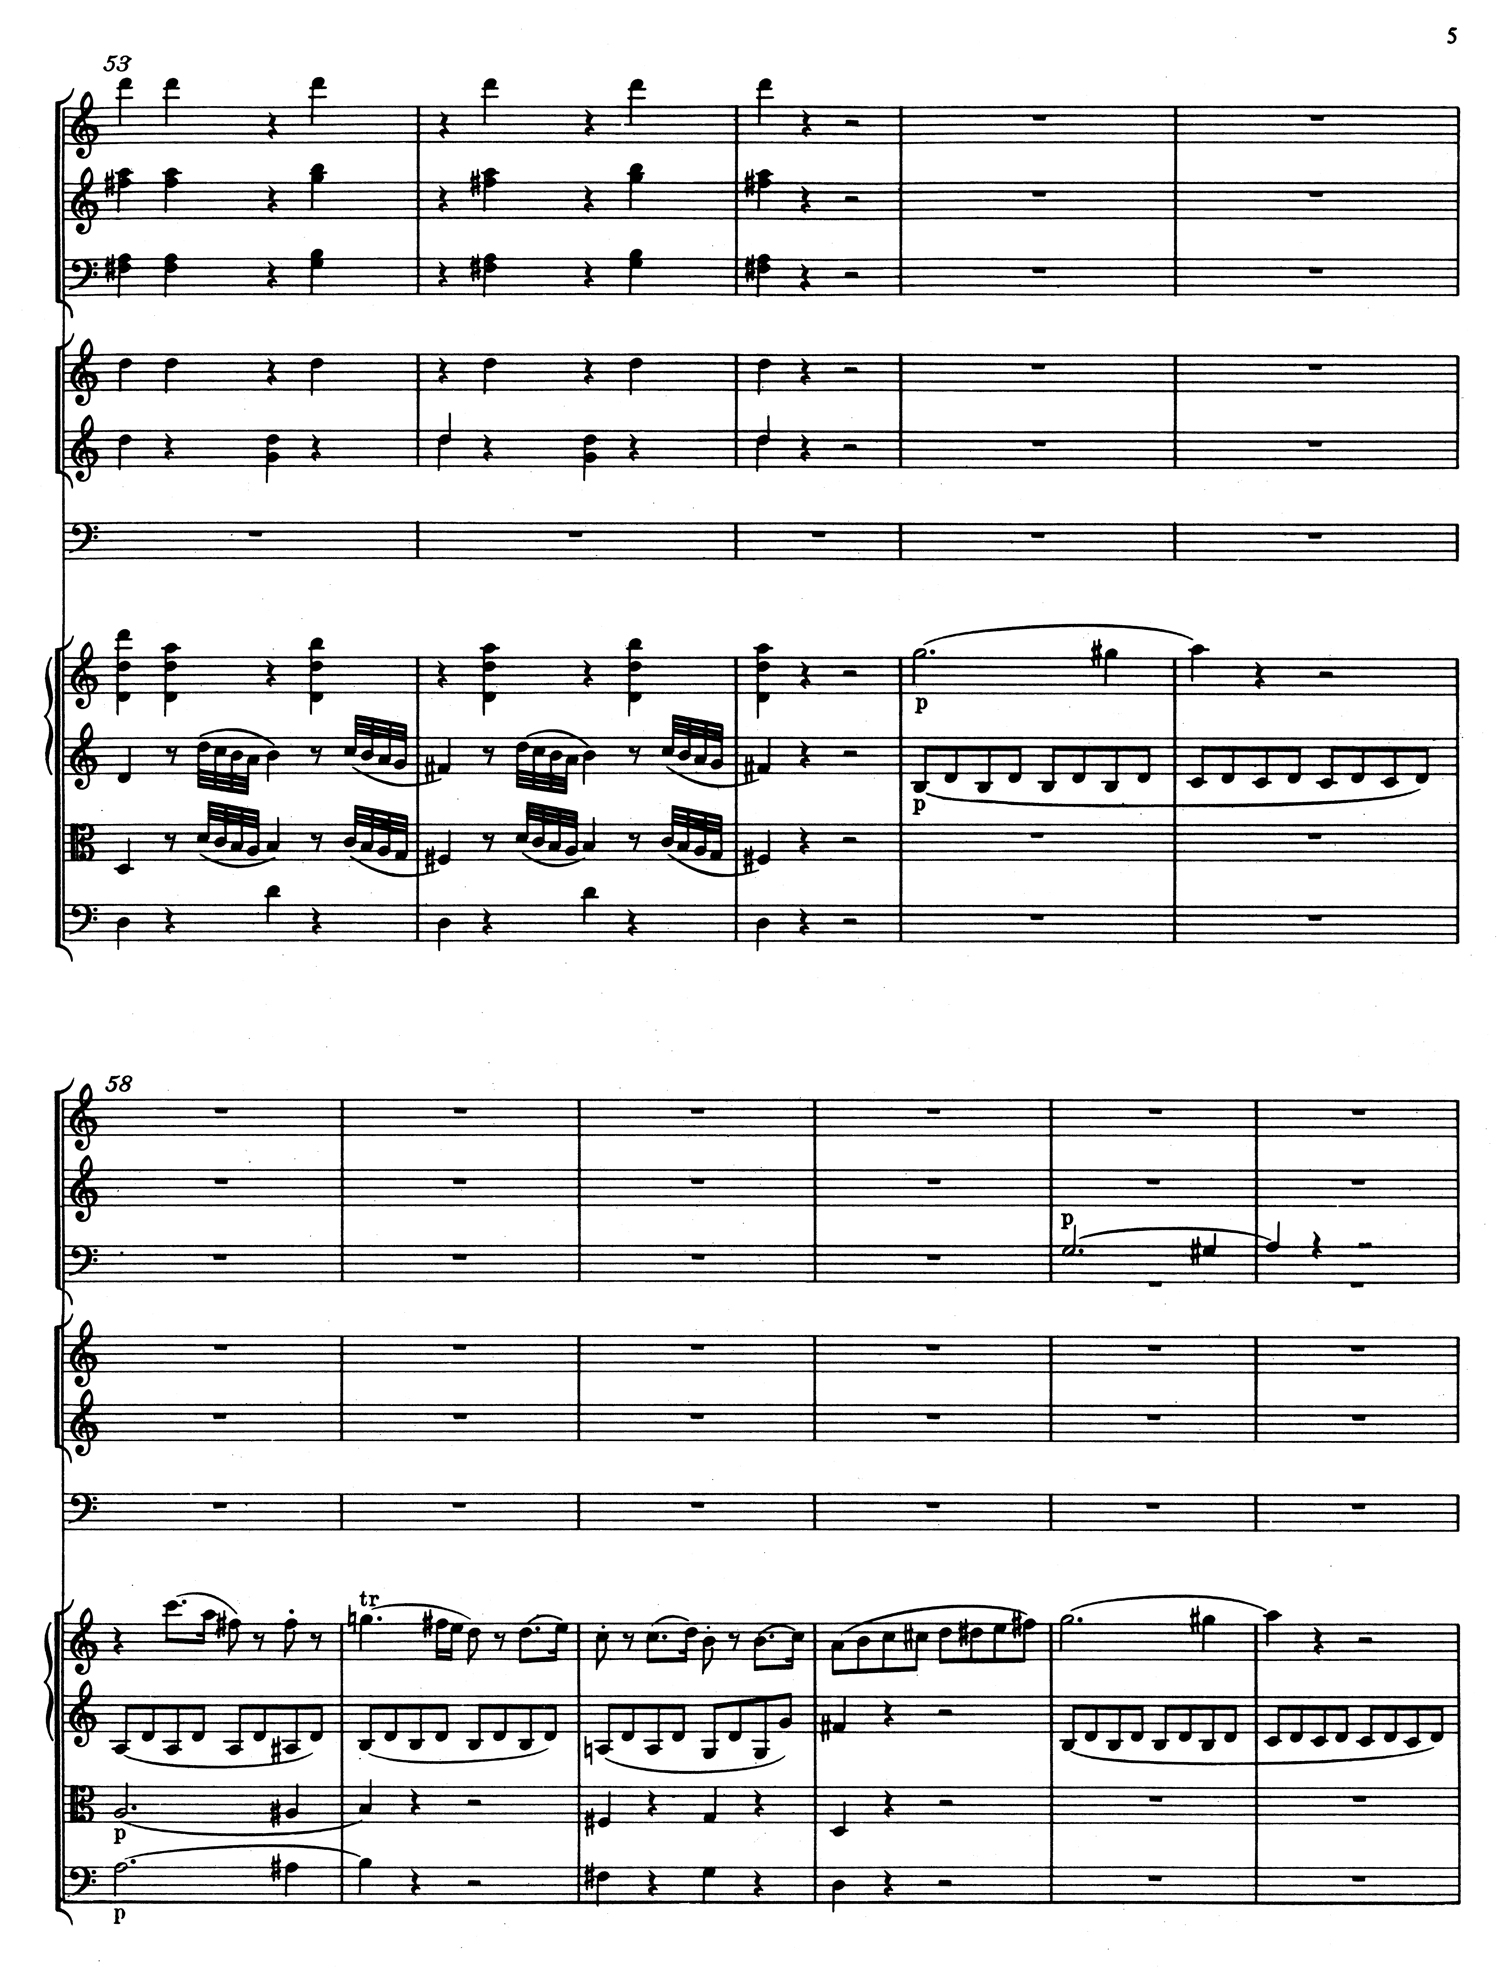 Mozart Jupiter Score 1.jpg